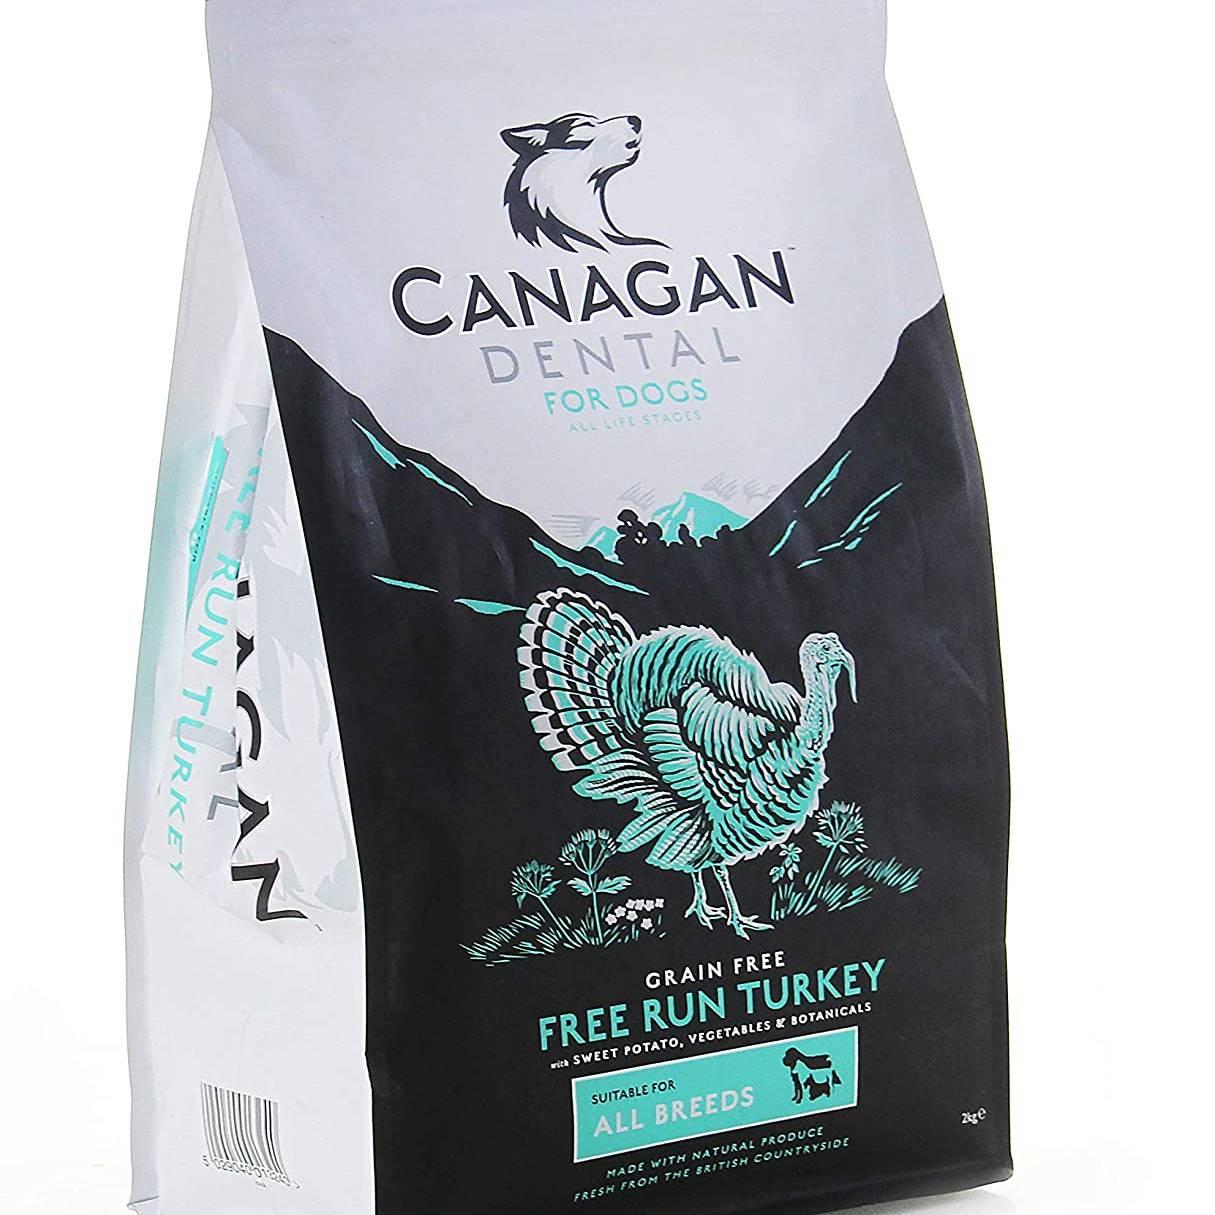 Canagan Dental for Dogs 2kg